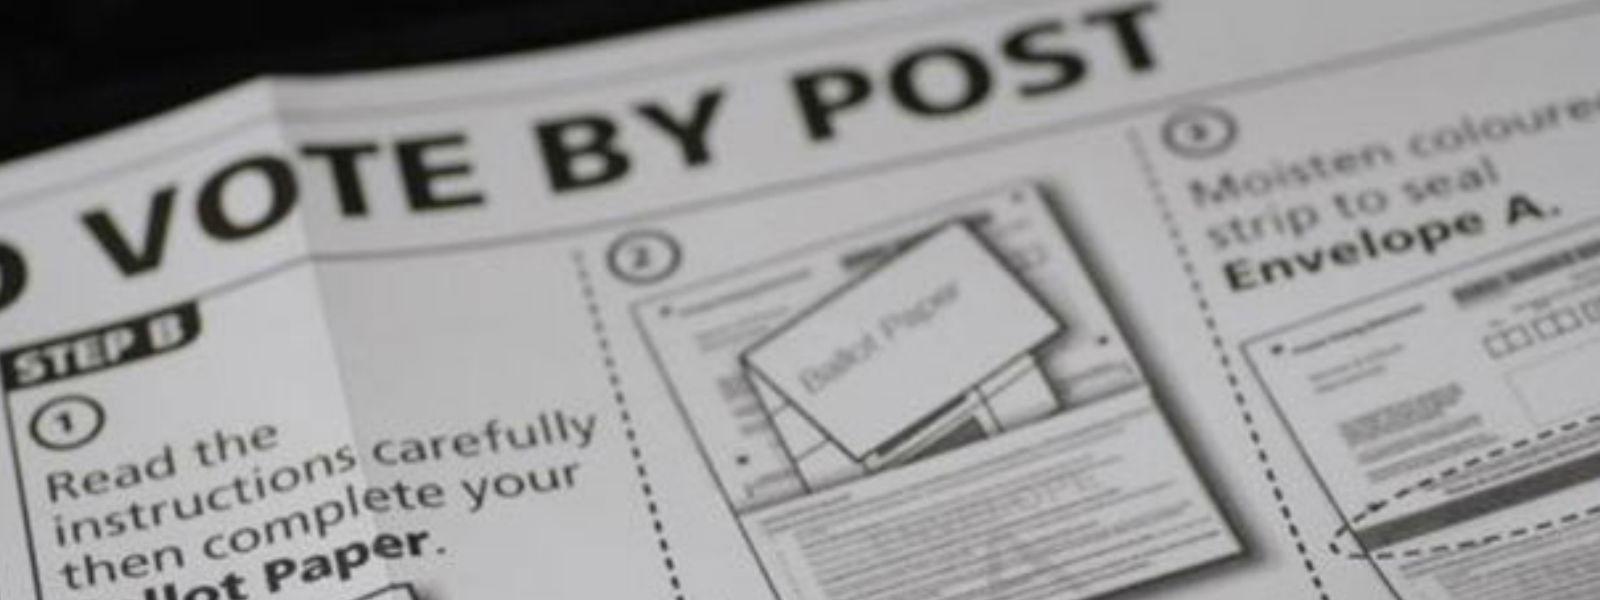 Phase 2 of postal voting begins